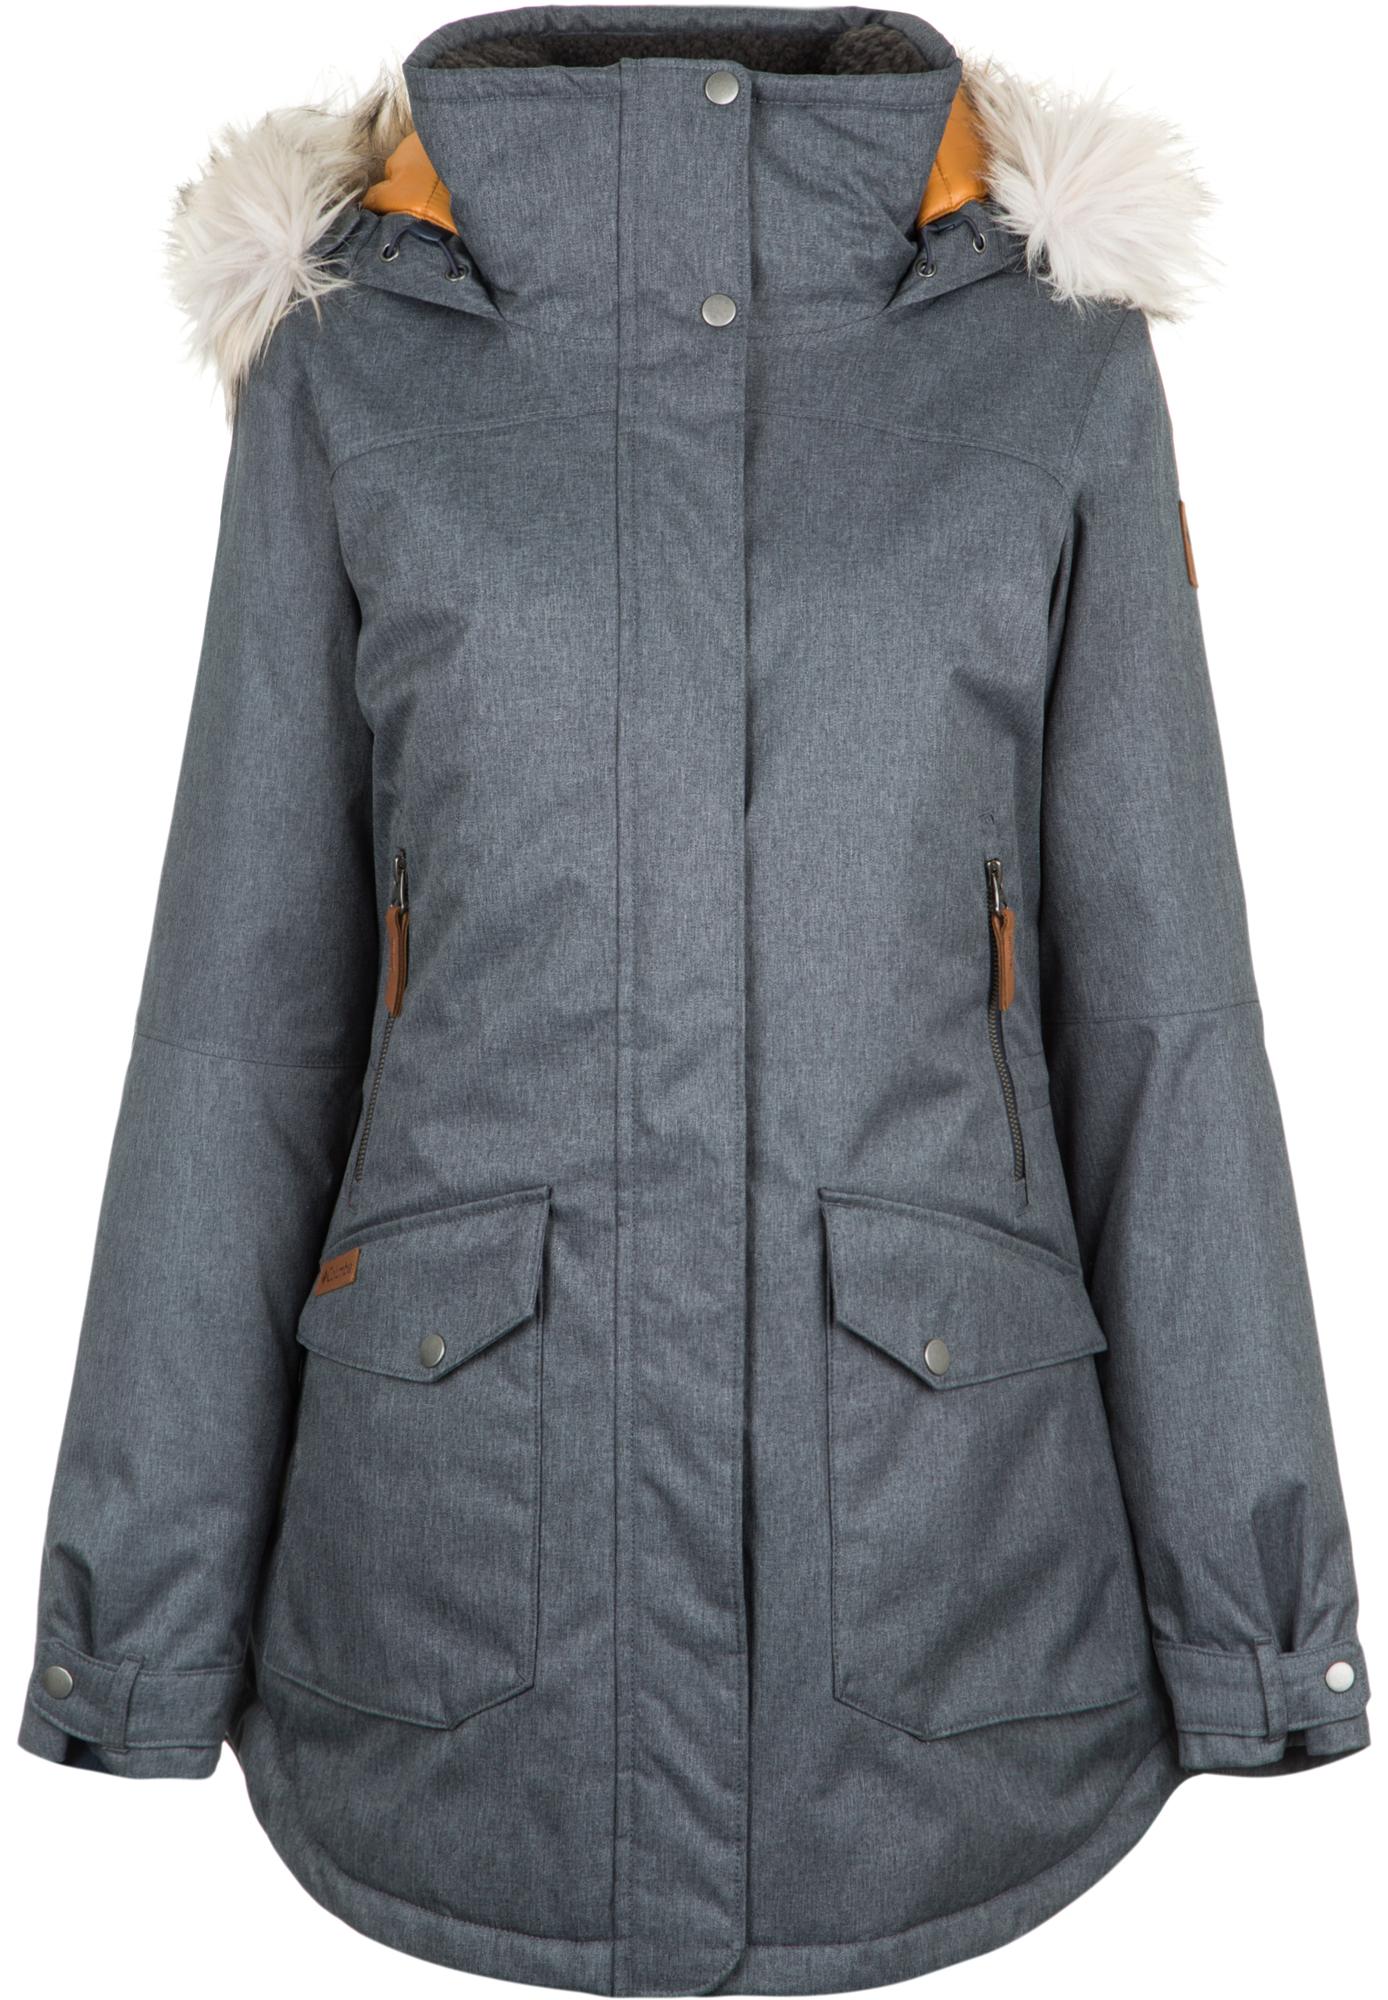 Columbia Куртка пуховая женская Columbia Barlow Pass 550 Turbodown II,  размер 48 columbia куртка пуховая cda40b8b88c